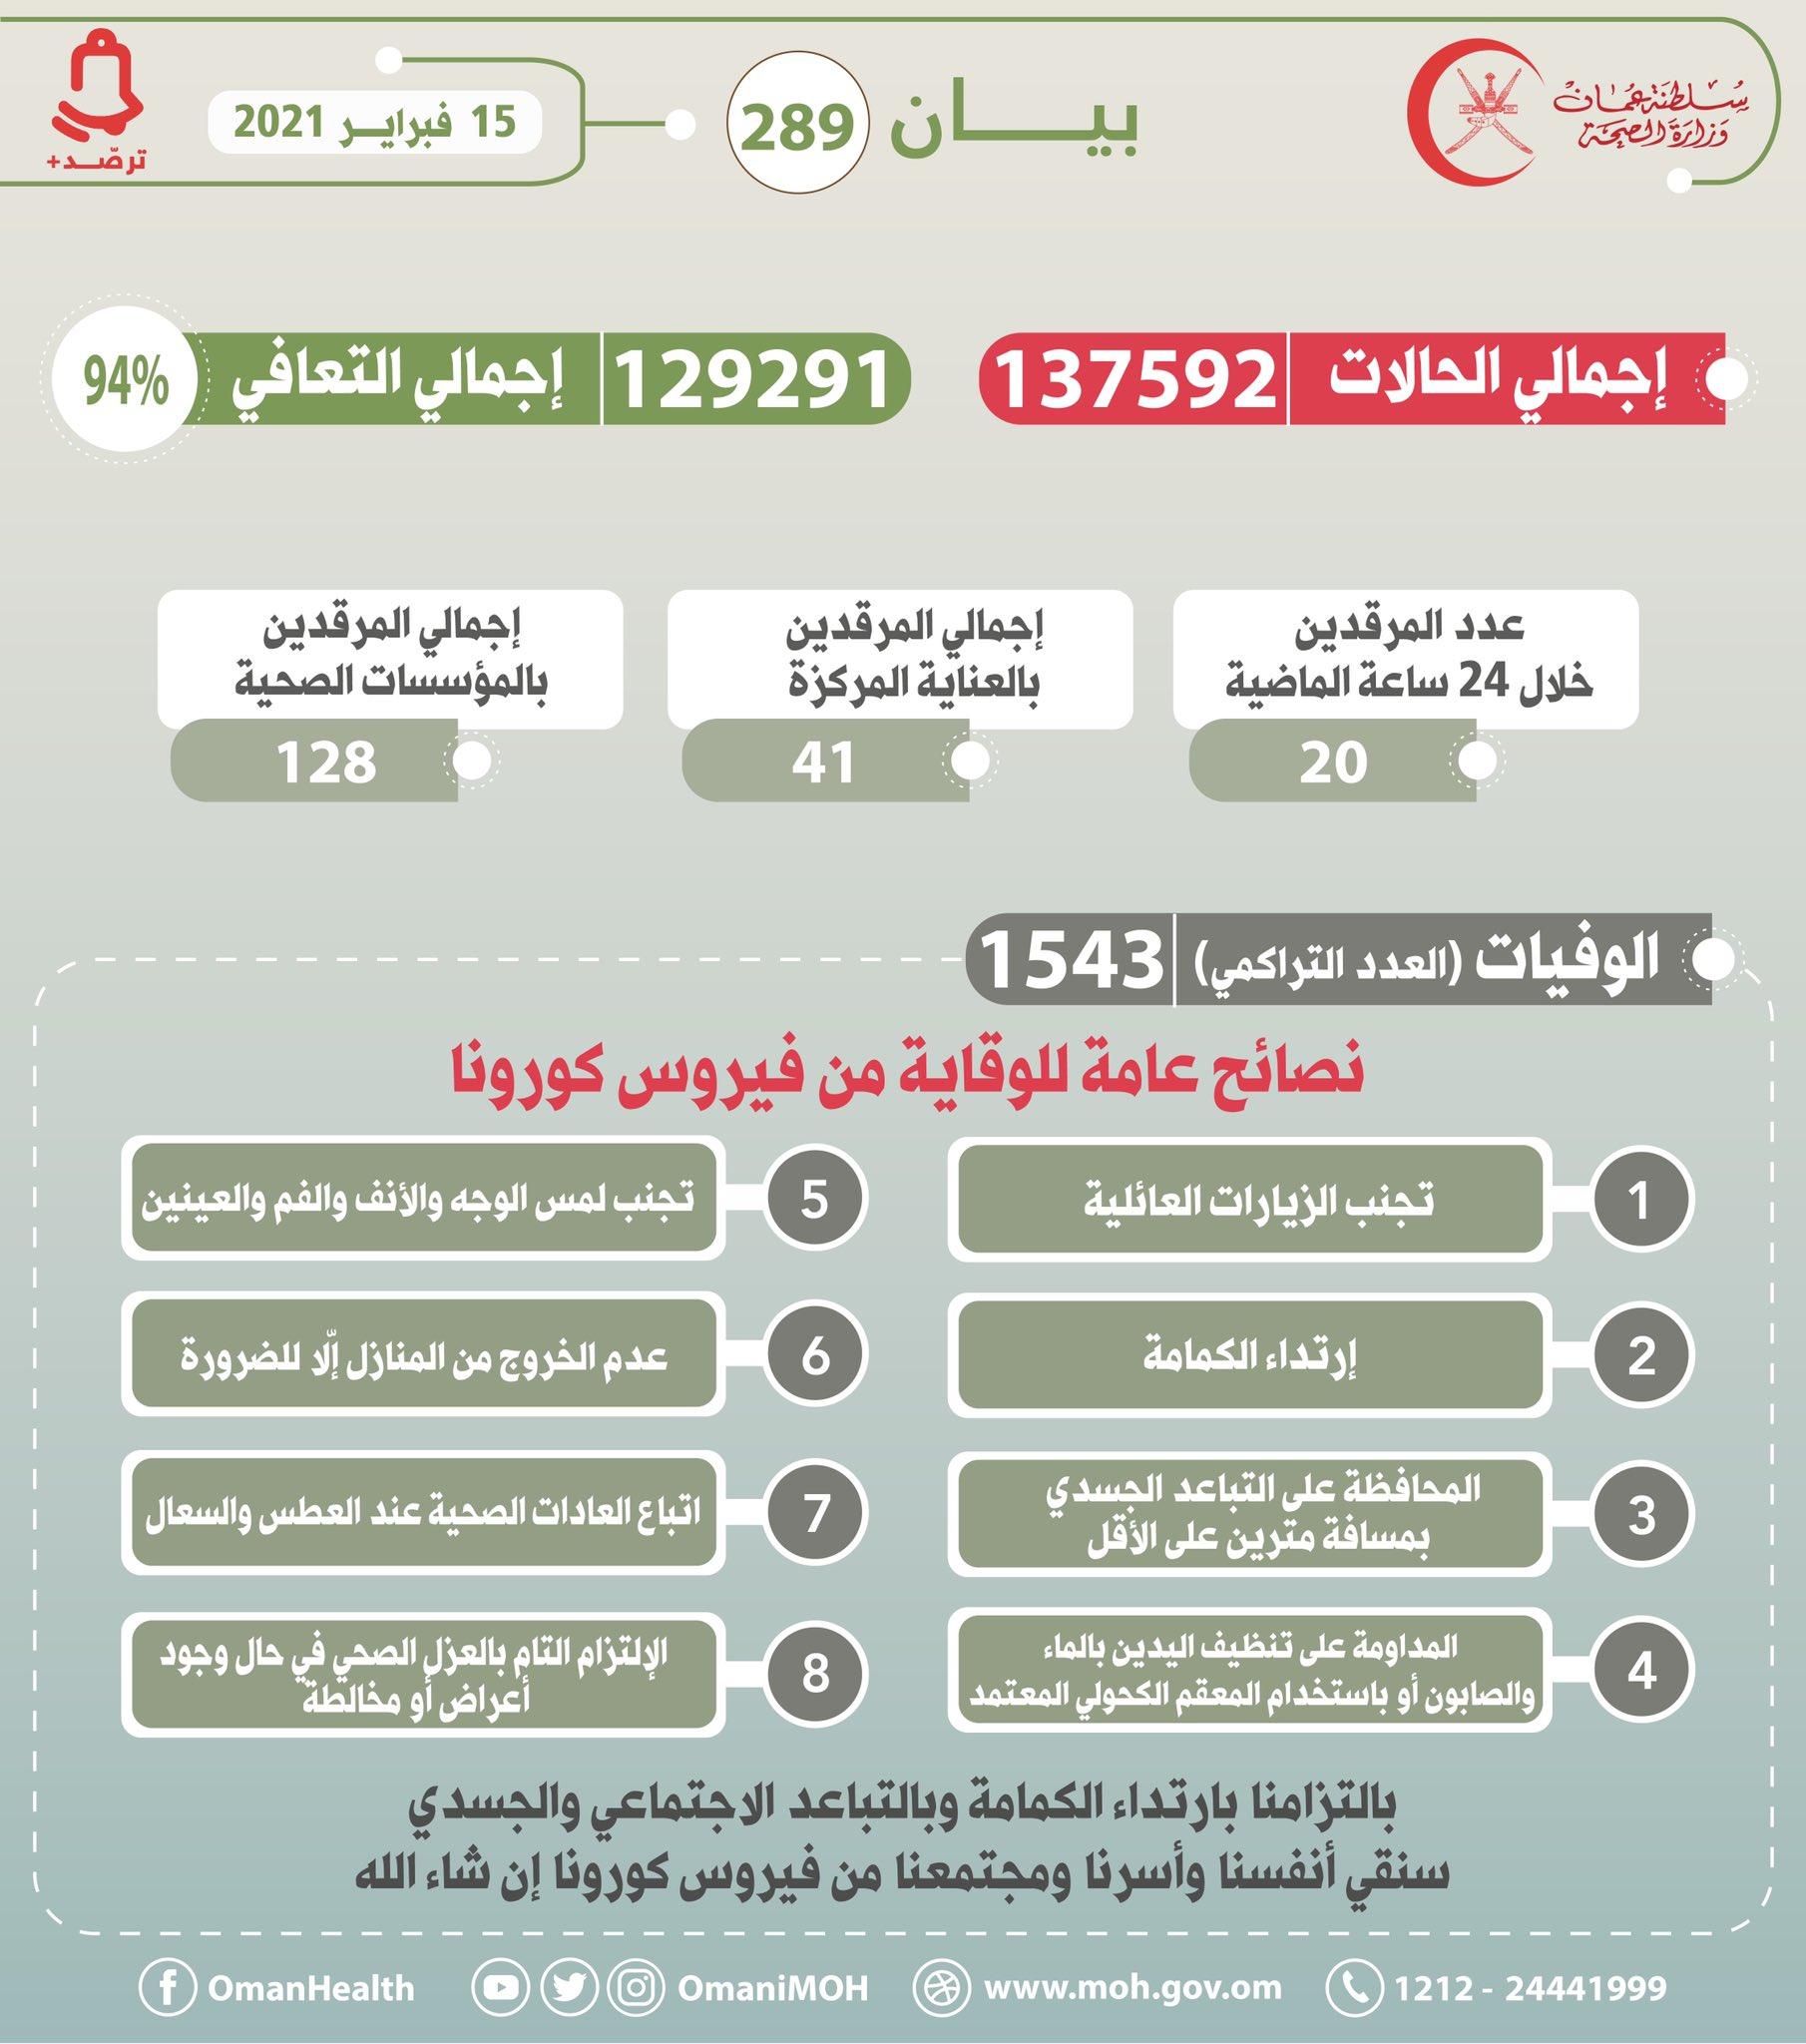 بيان رقم 289 15 فبراير  2021م  #عمان_تواجه_كورونا